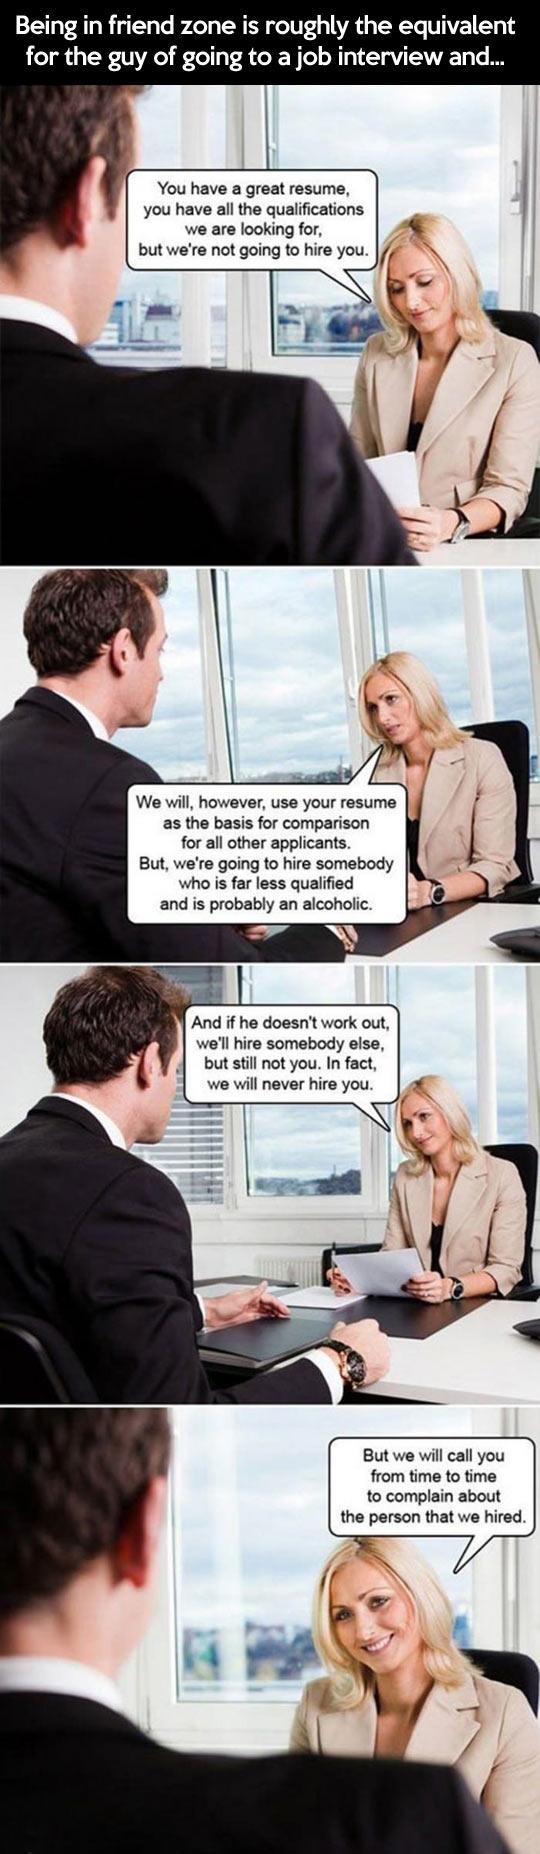 funny-job-interview-friendzone-explain